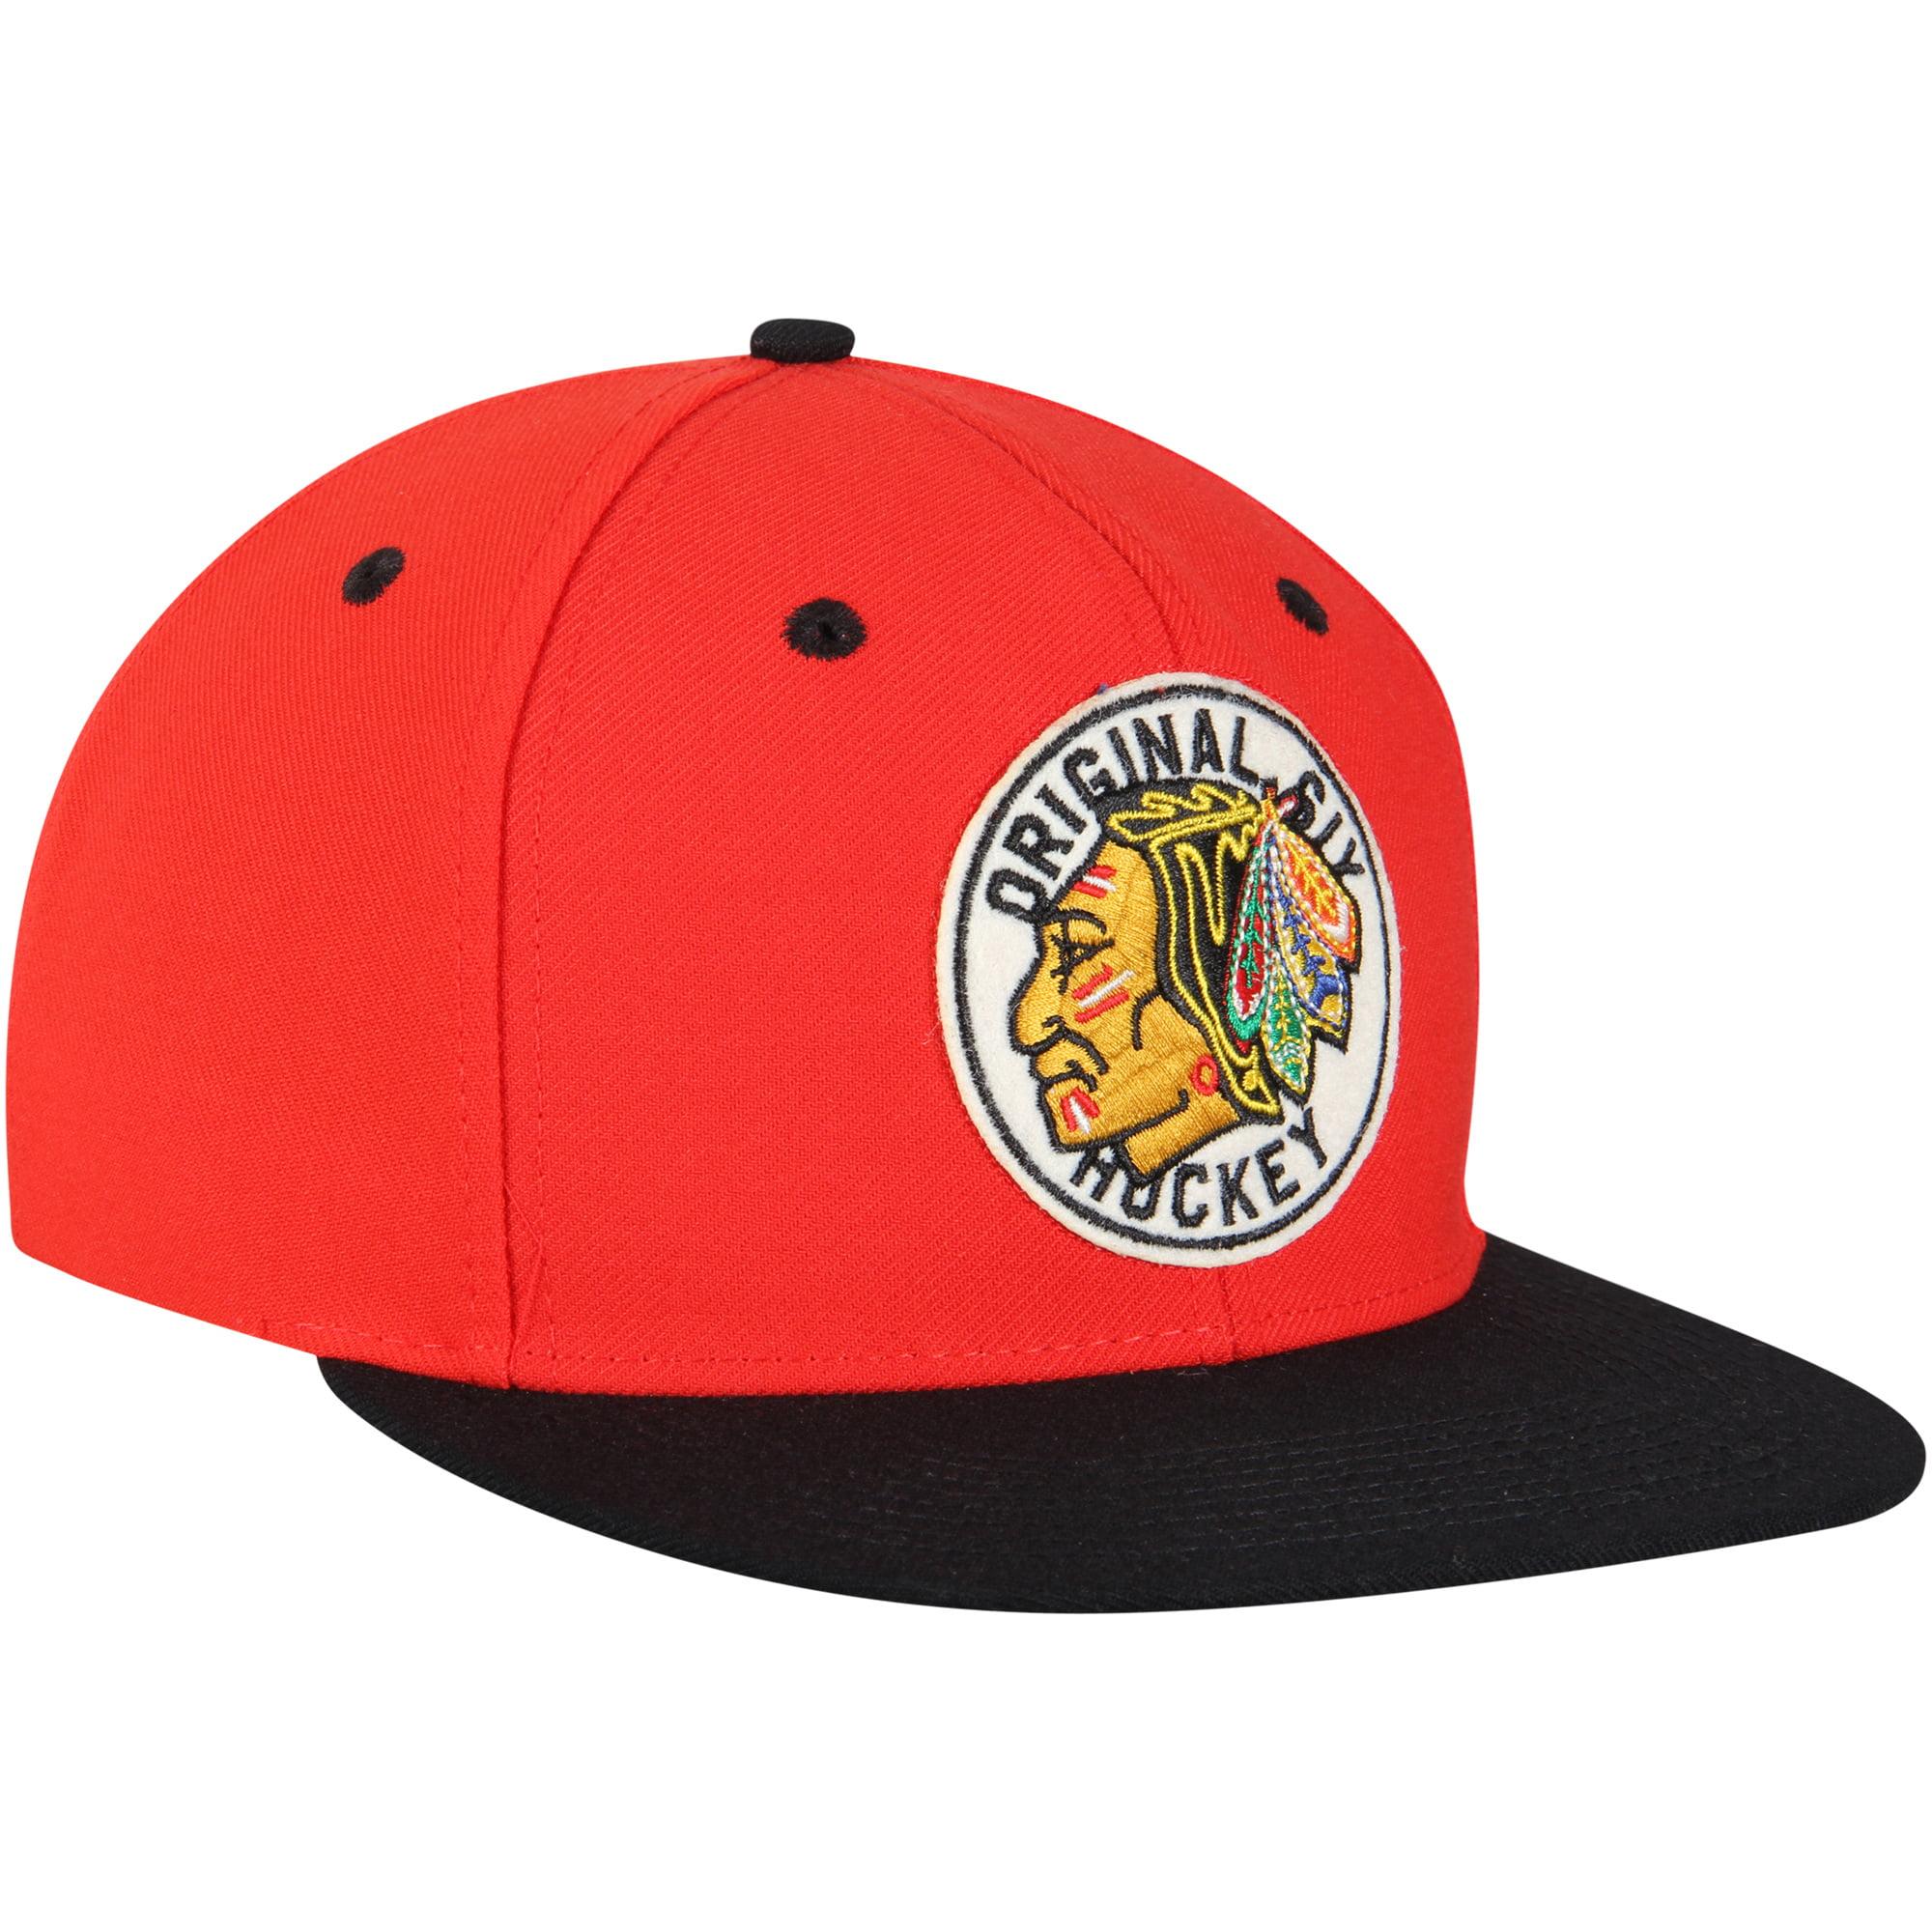 Chicago Blackhawks adidas Original Six Flat Brim Snapback Adjustable Hat -  Red - OSFA - Walmart.com 0845c3f51f21